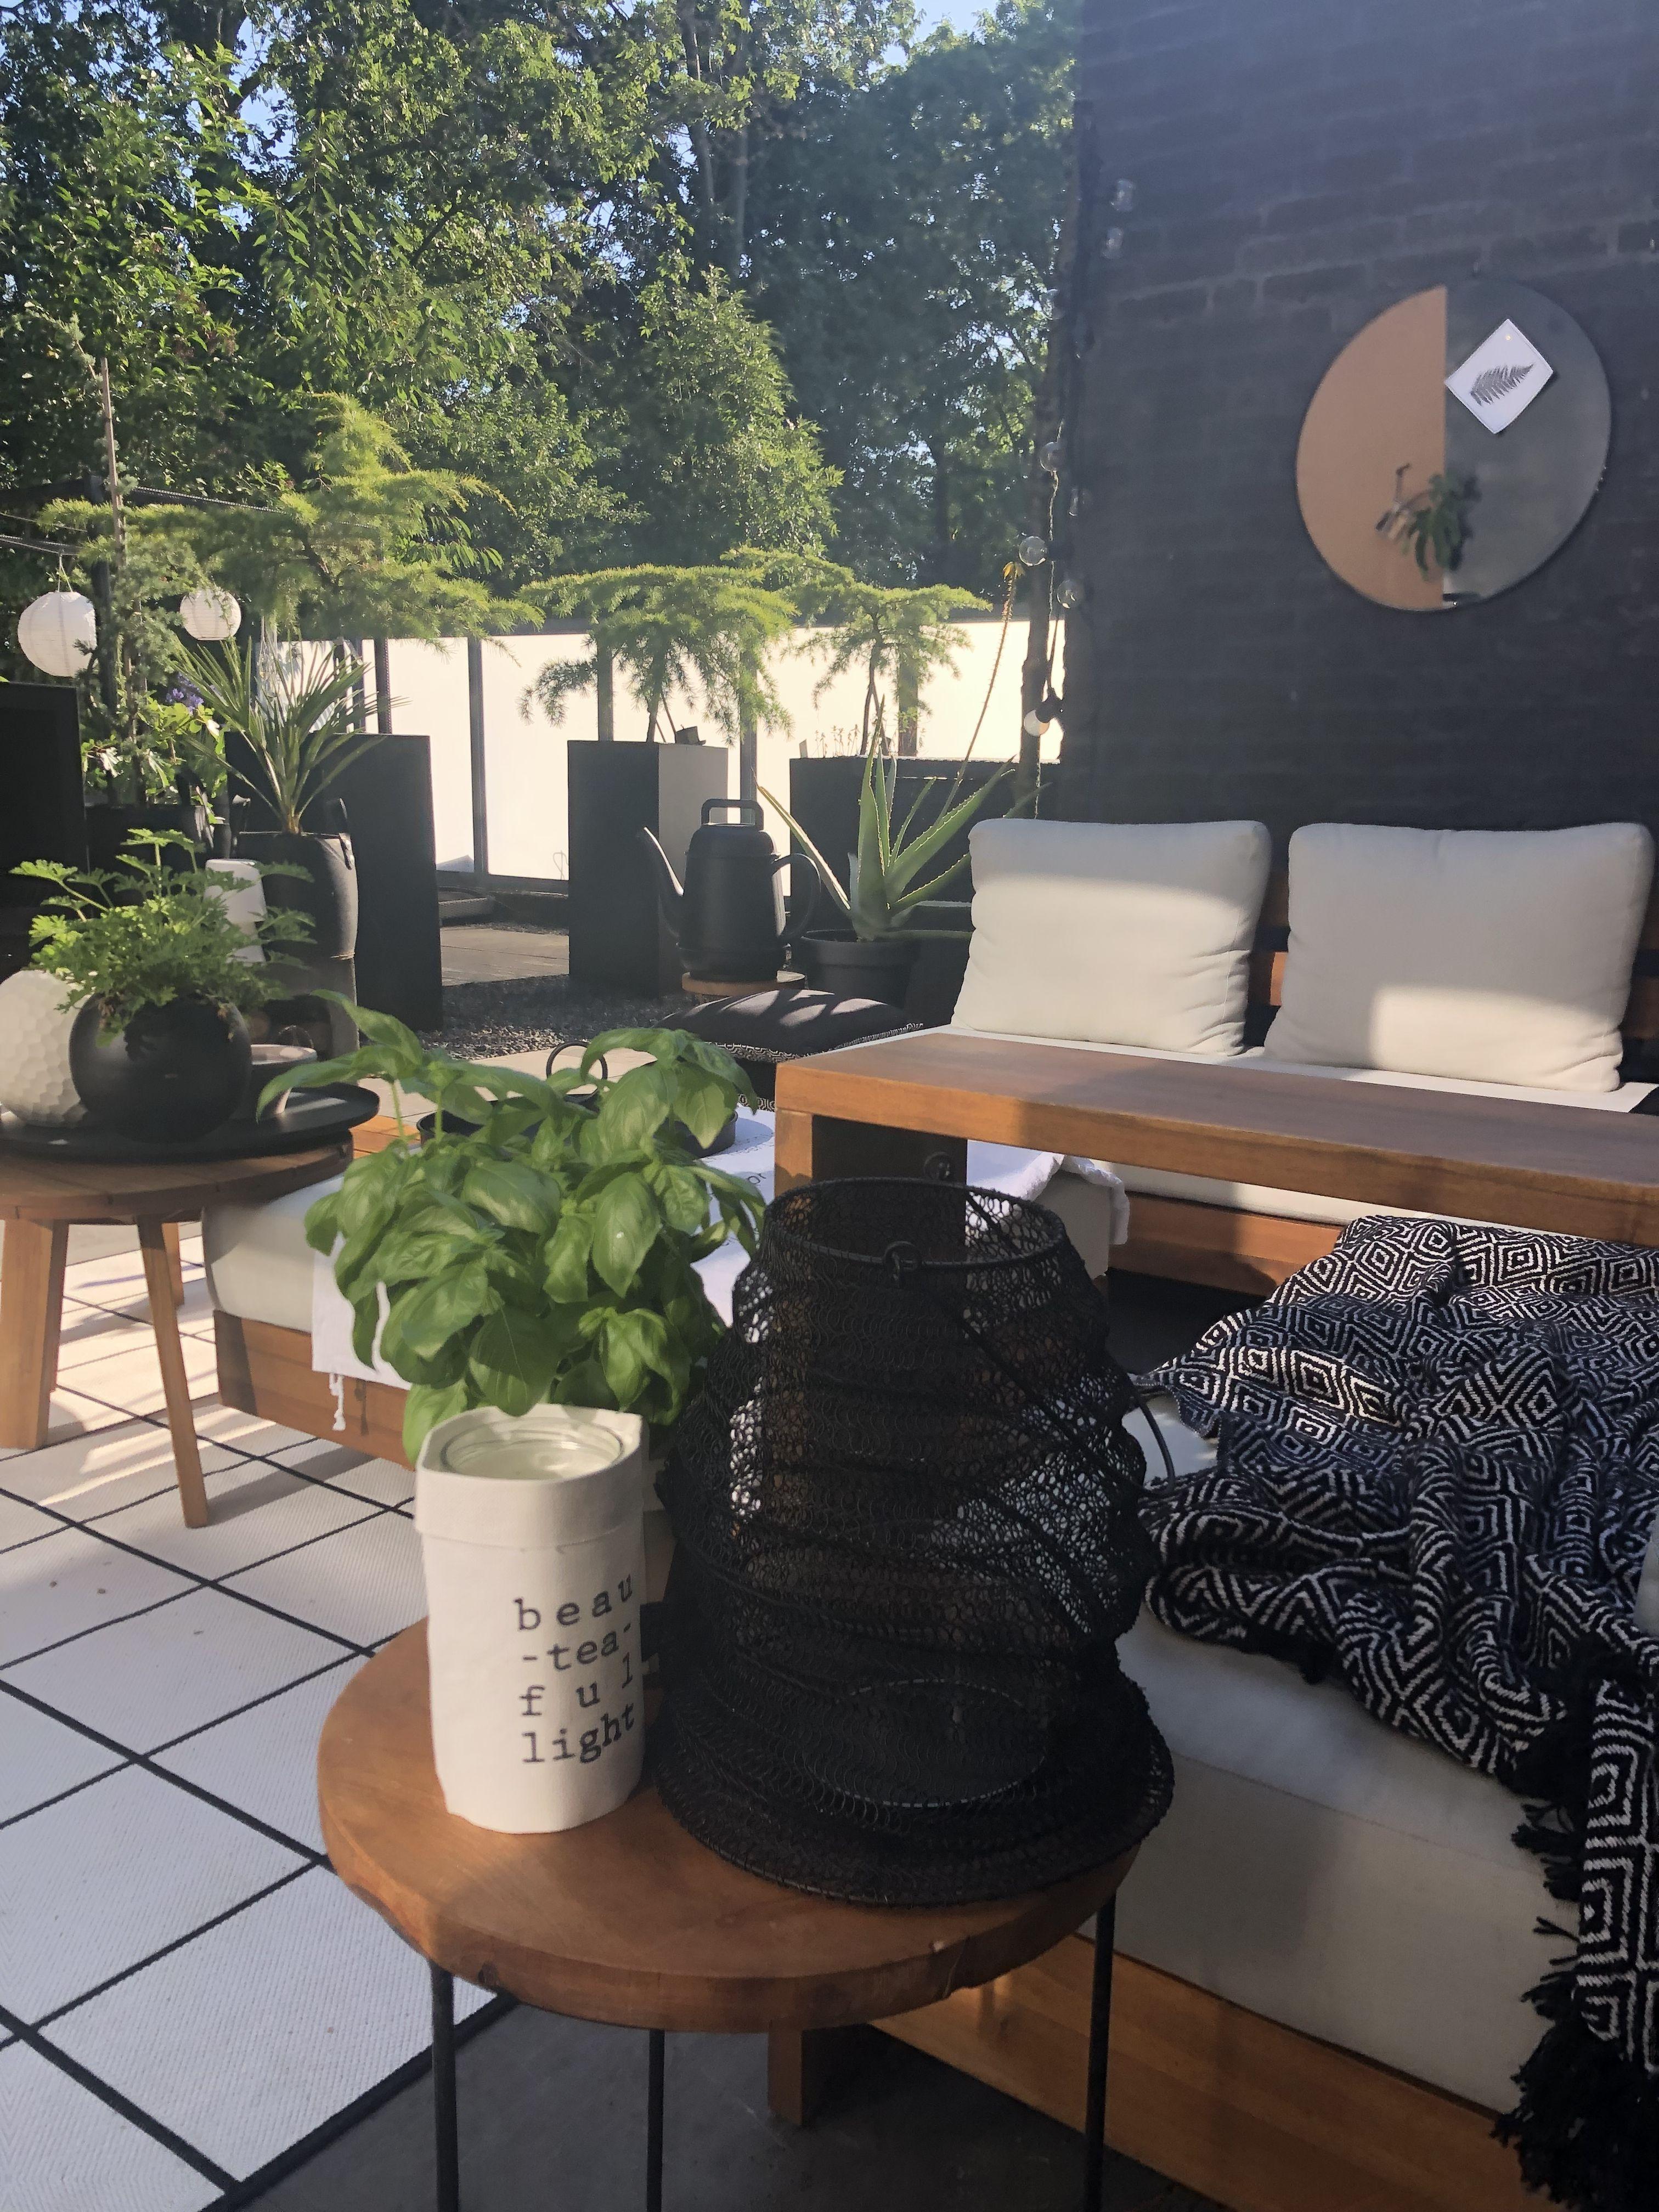 #garden #gardeninspiration #gardenideas #tuin #tuininspiratie #loungebank